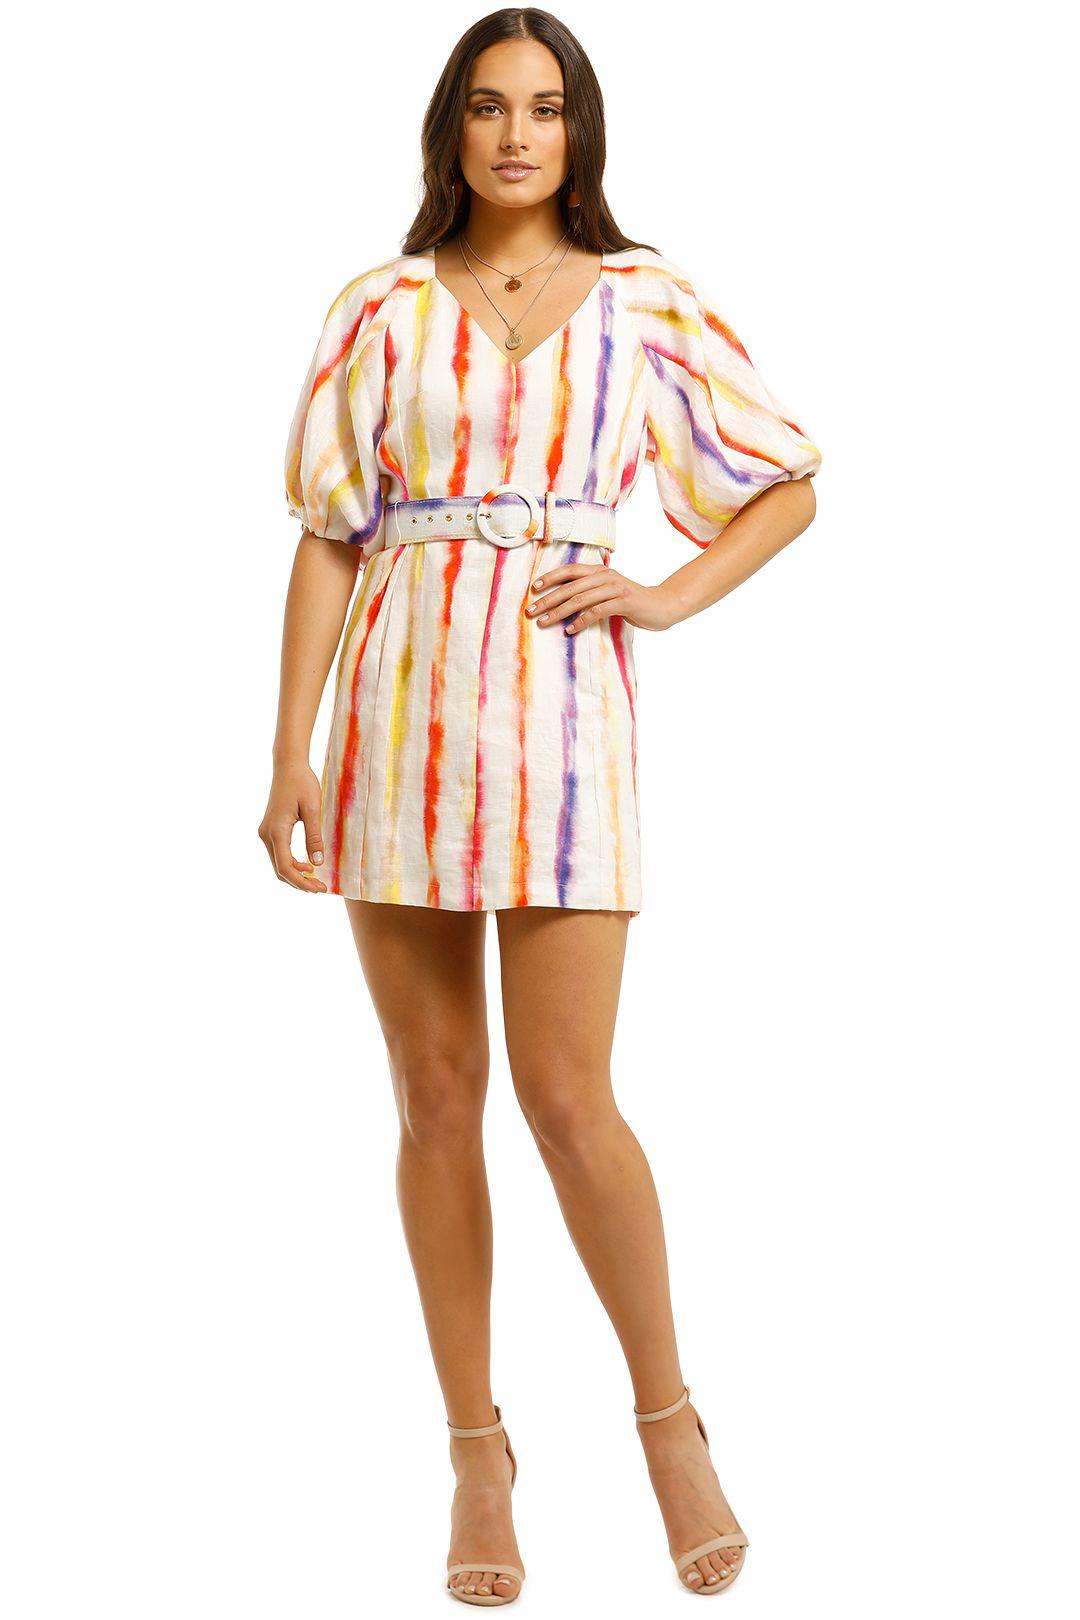 Nicholas-Shaanti-Dress-Brushed-Rainbow-Front